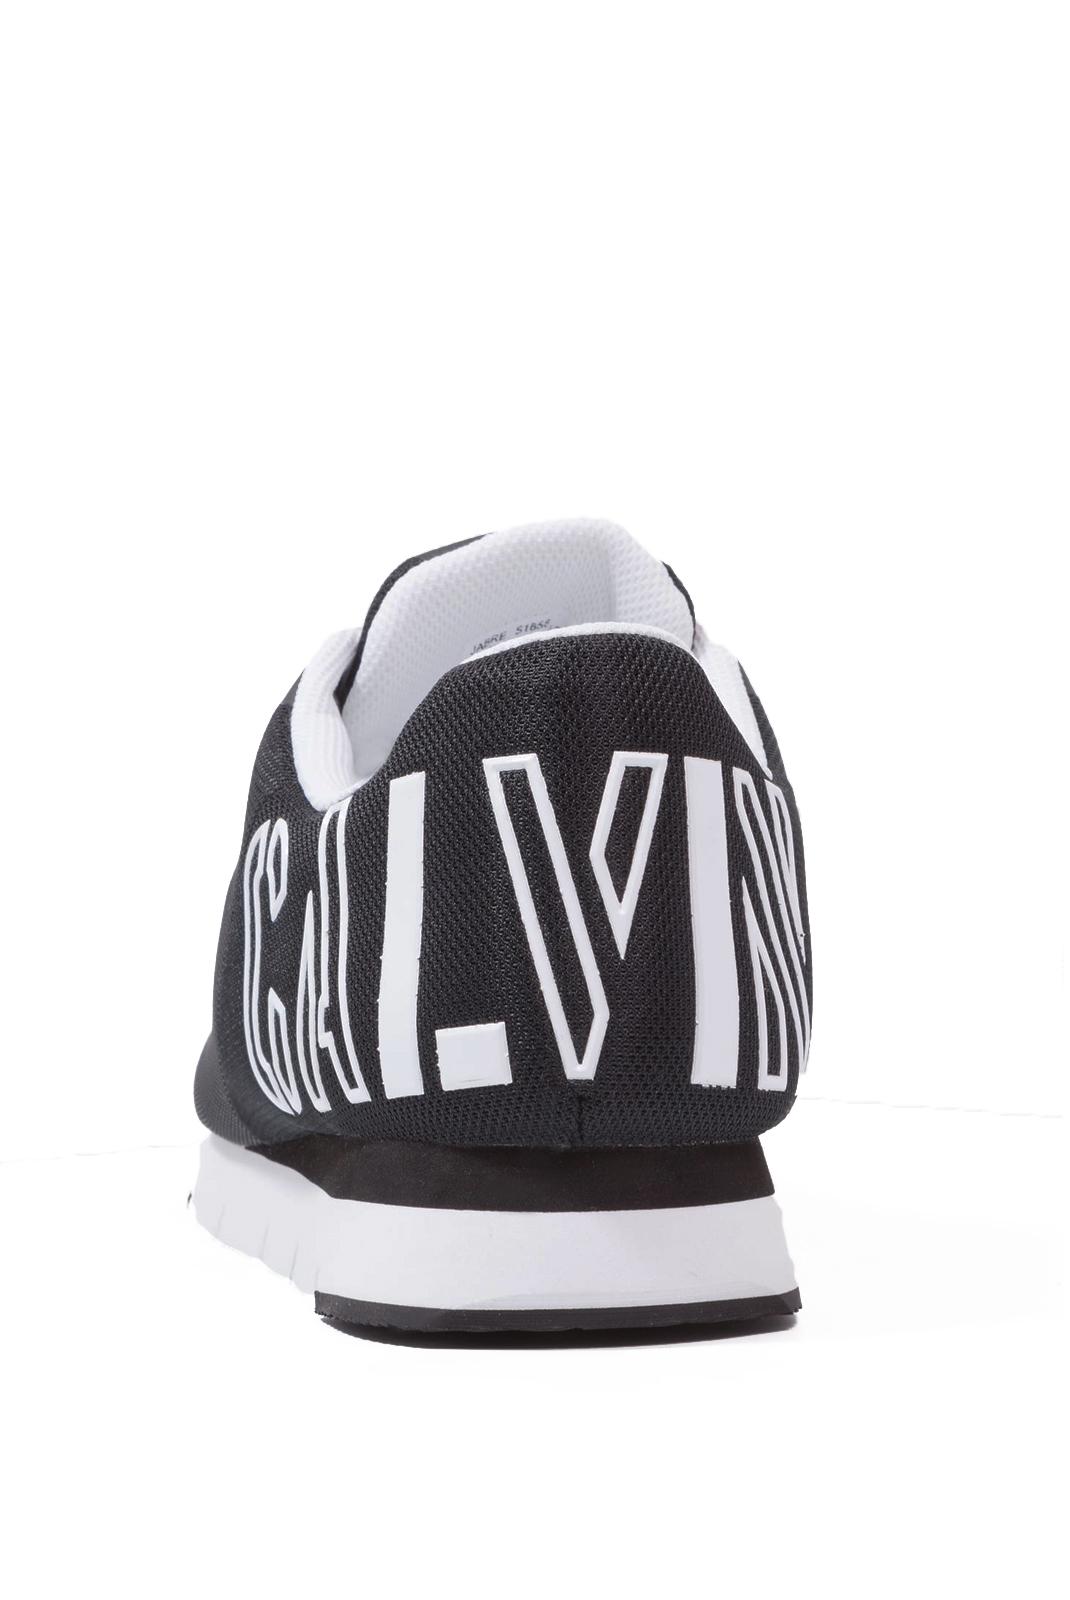 Baskets / Sport  Calvin klein JABRE MESH BLACK/WHITE